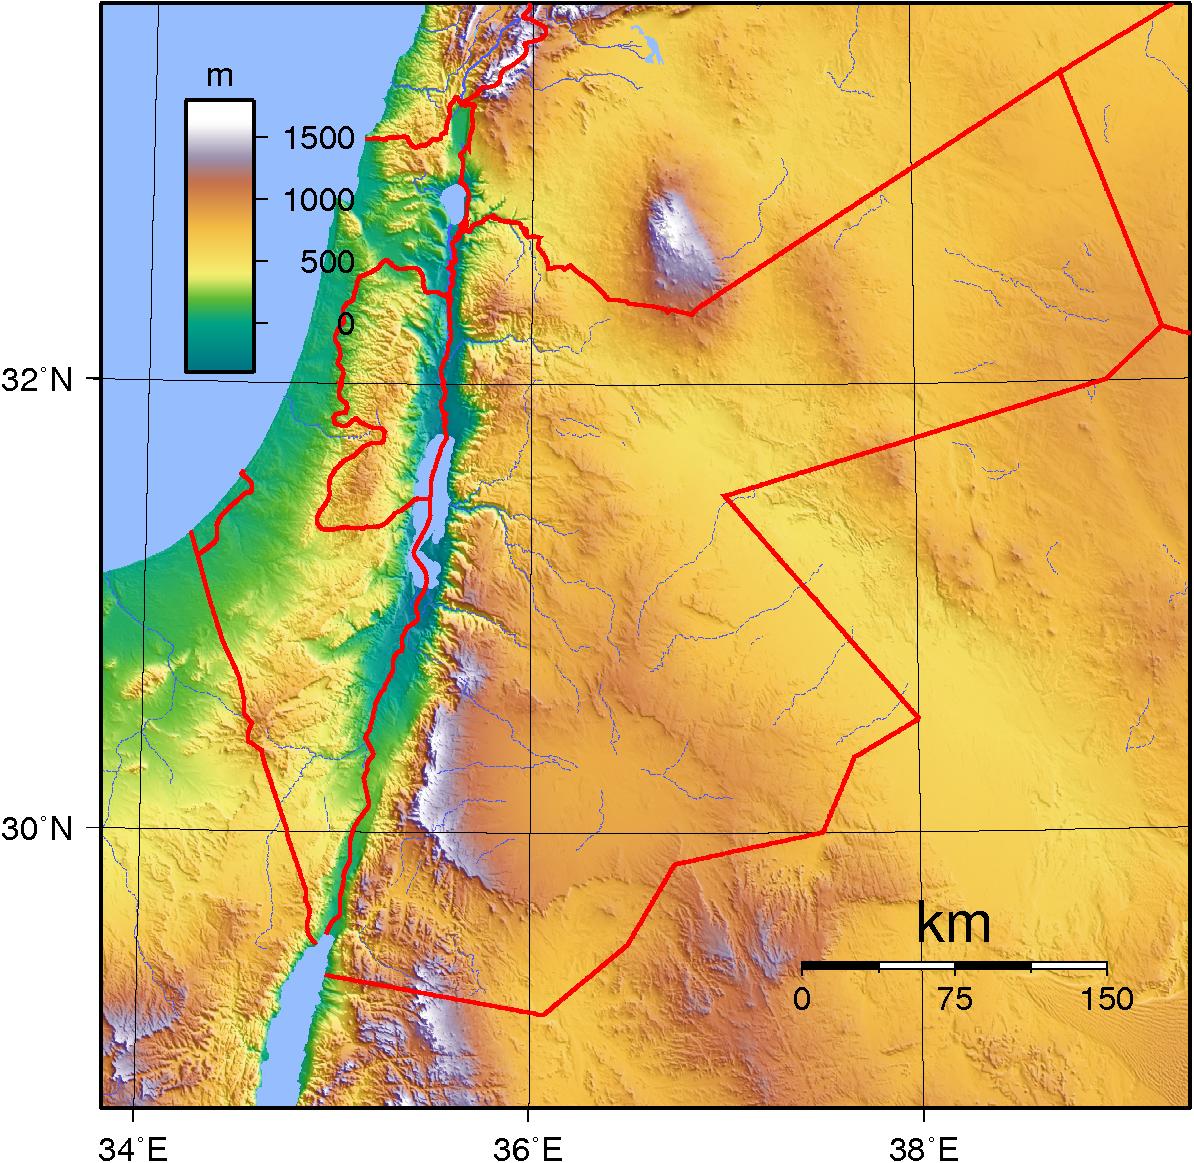 Jordan Topography